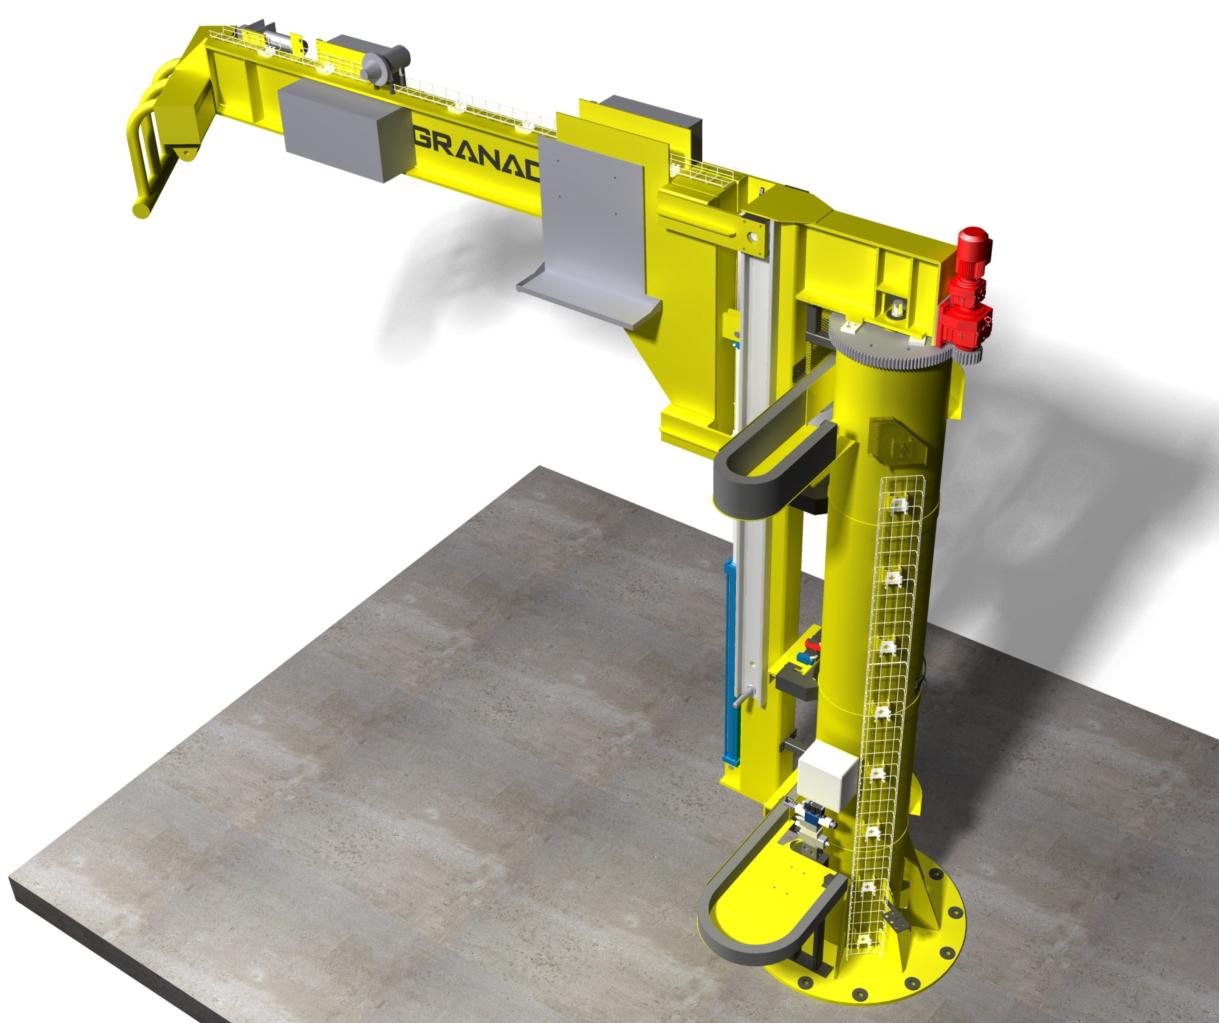 Motorized Wall Mounted Jib Crane : Siemens jib crane granada